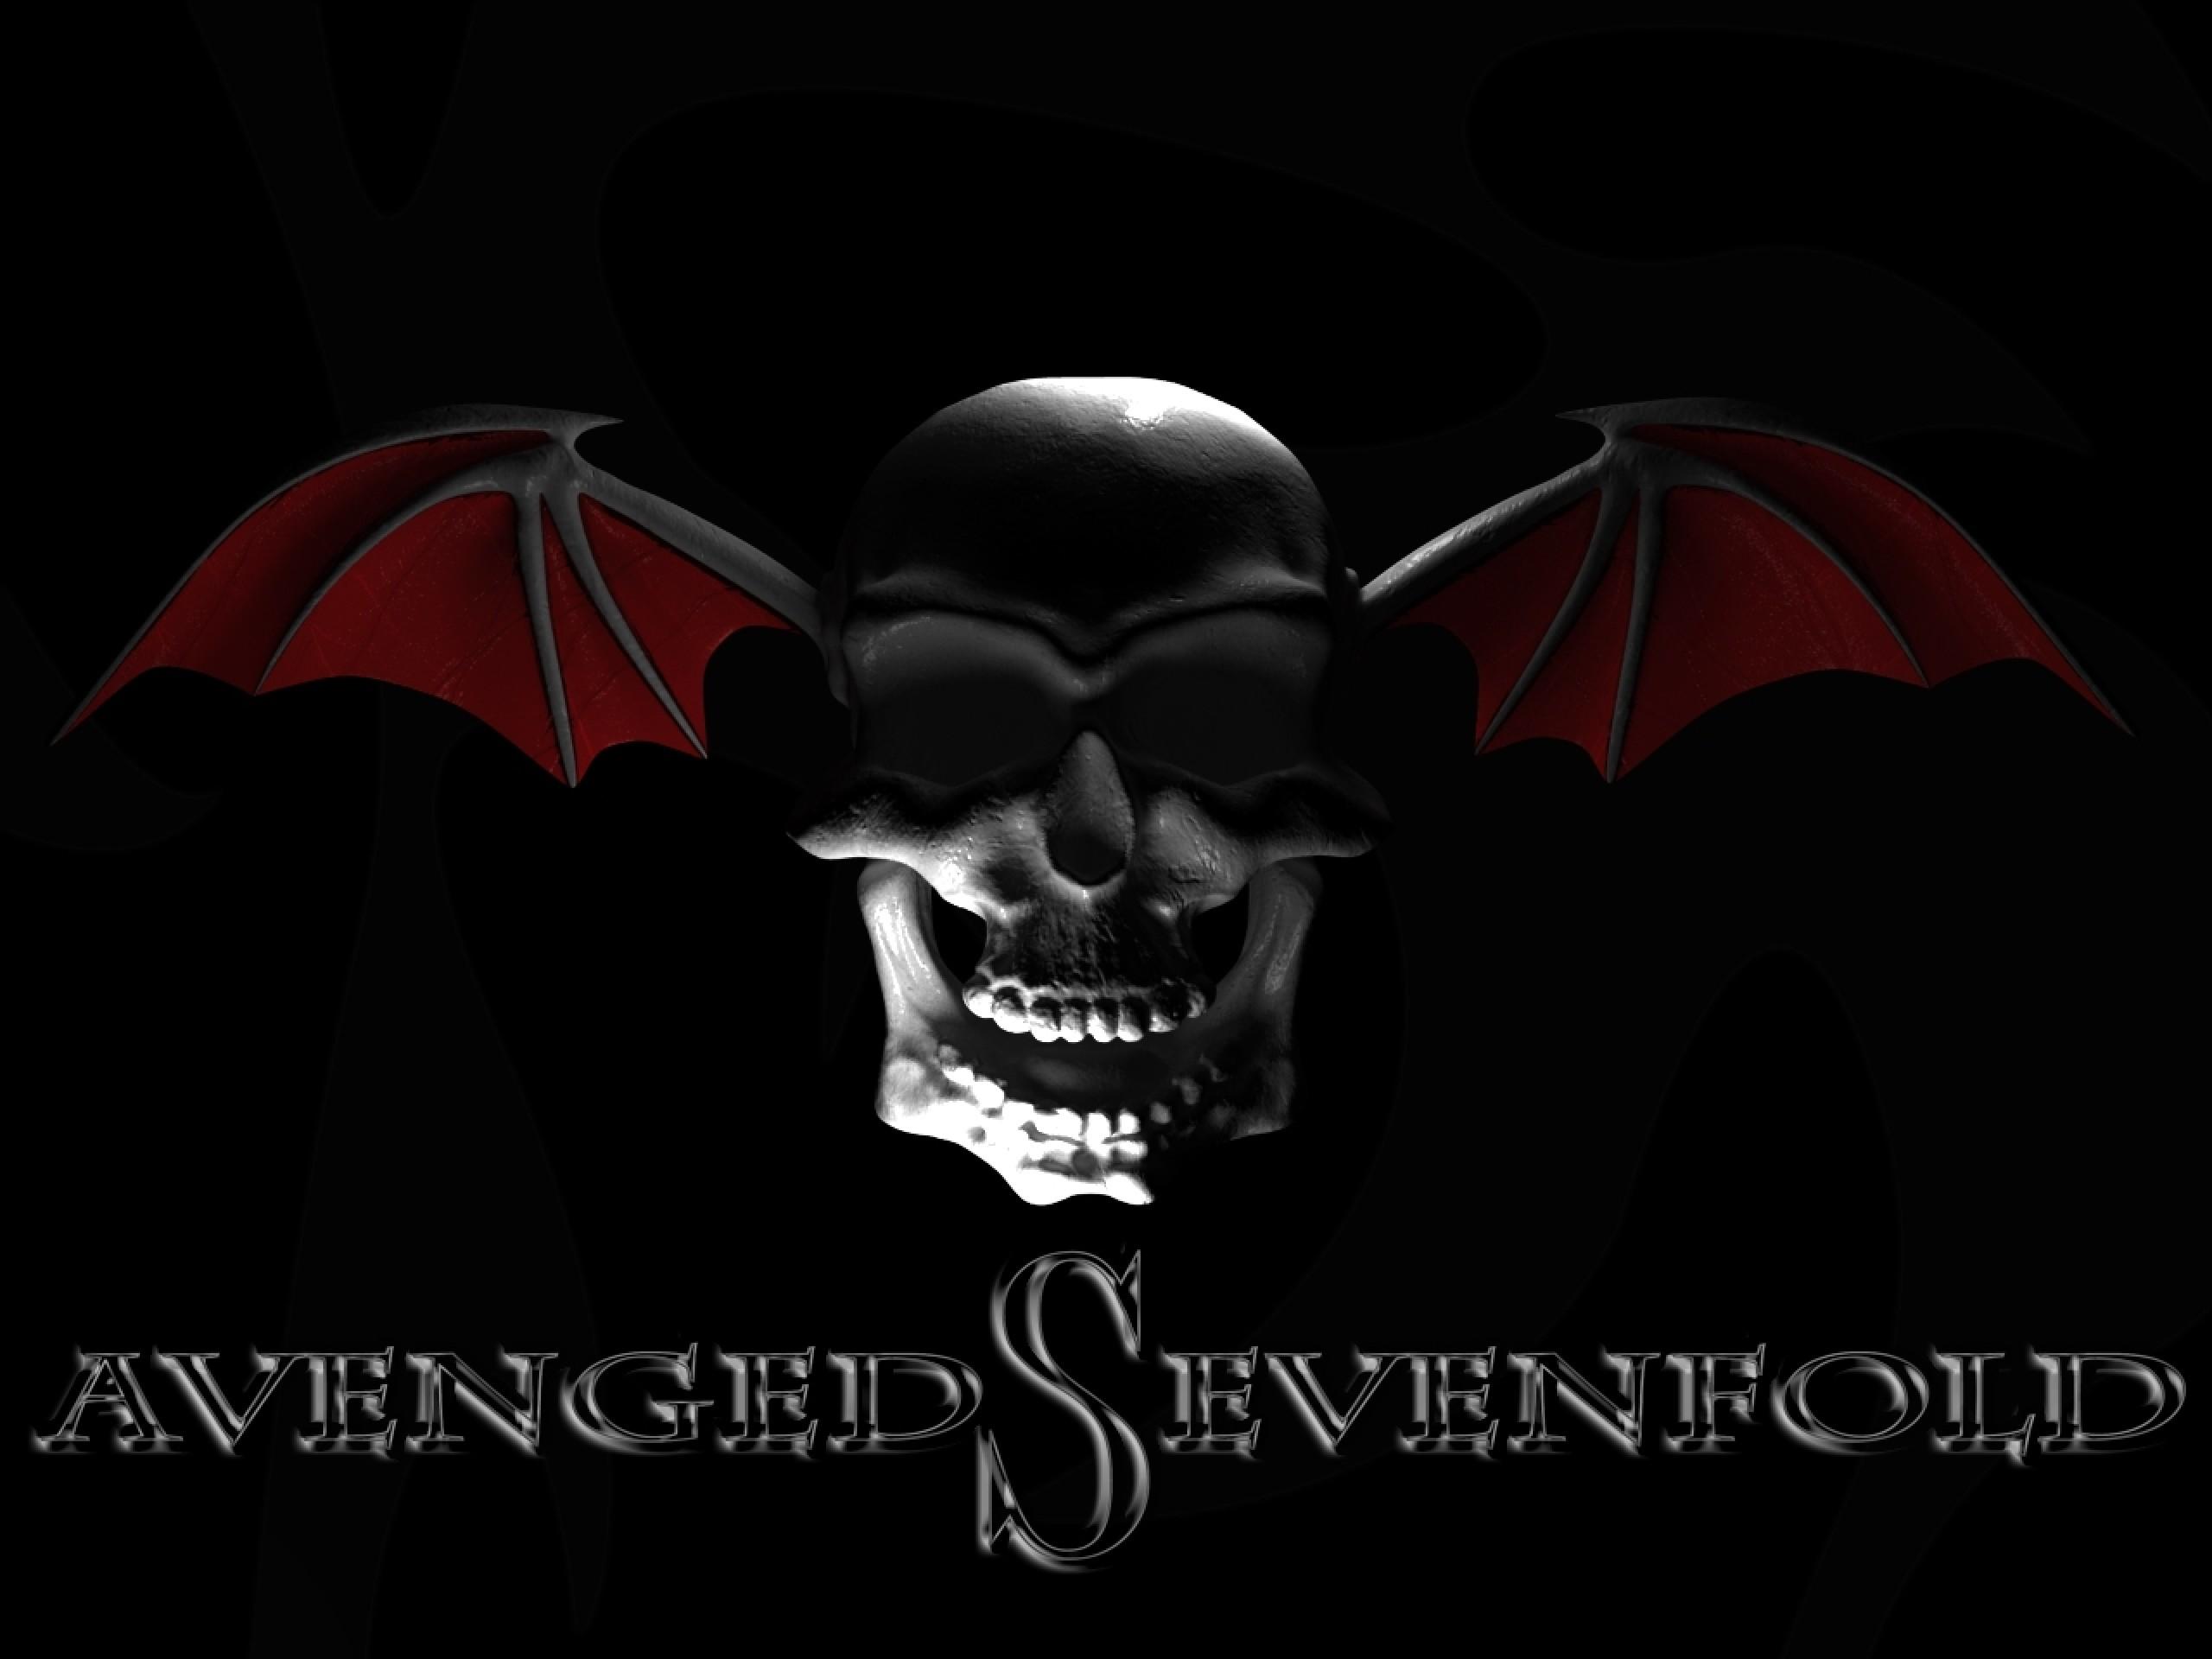 Avenged sevenfold background 61 images 1920x1080 slipknot wallpaper download 1920x1080 avenged sevenfold voltagebd Images